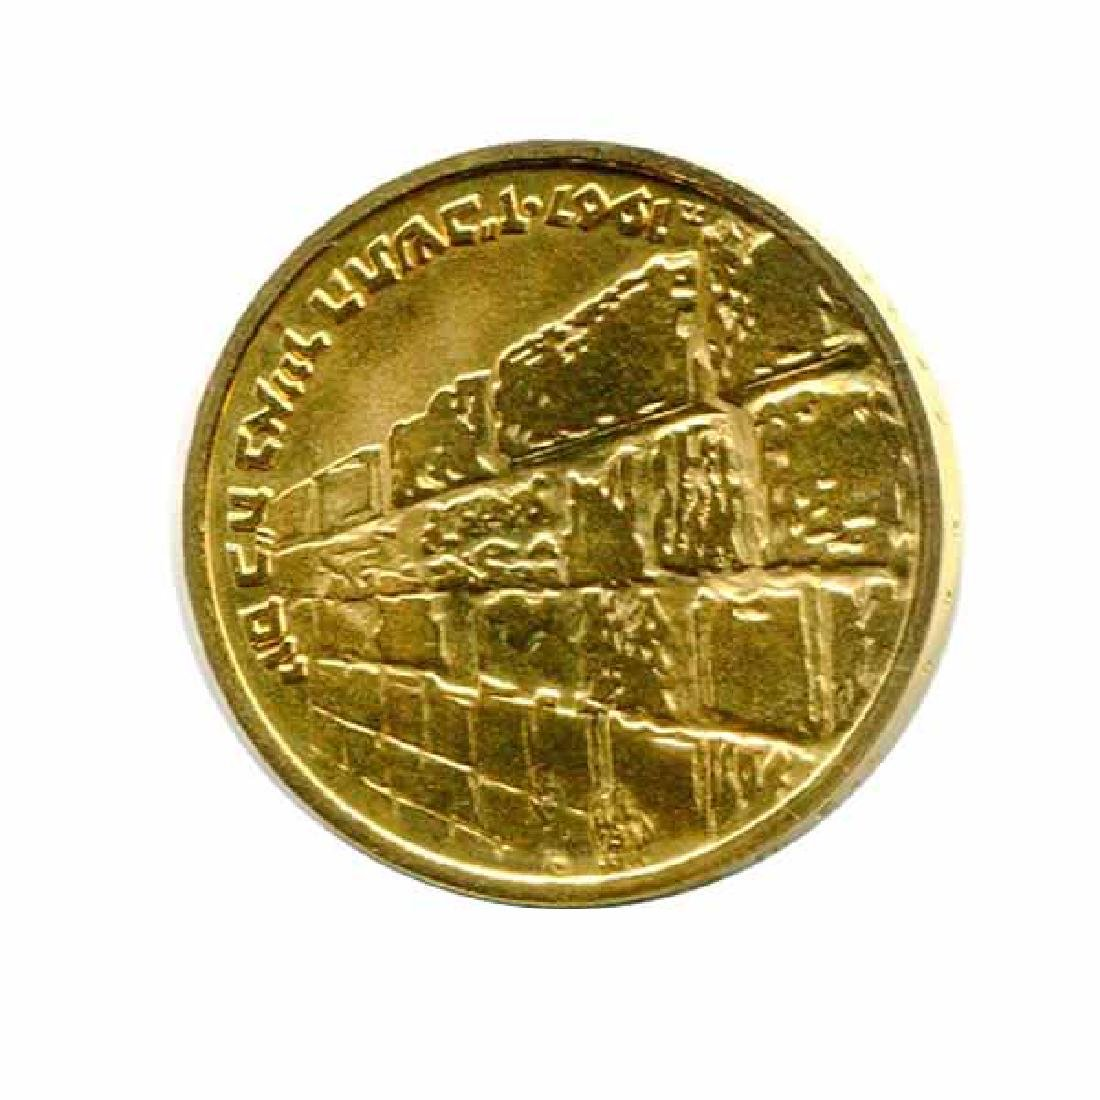 Israel 100 lirot gold PF 1967 Six Day War Victory